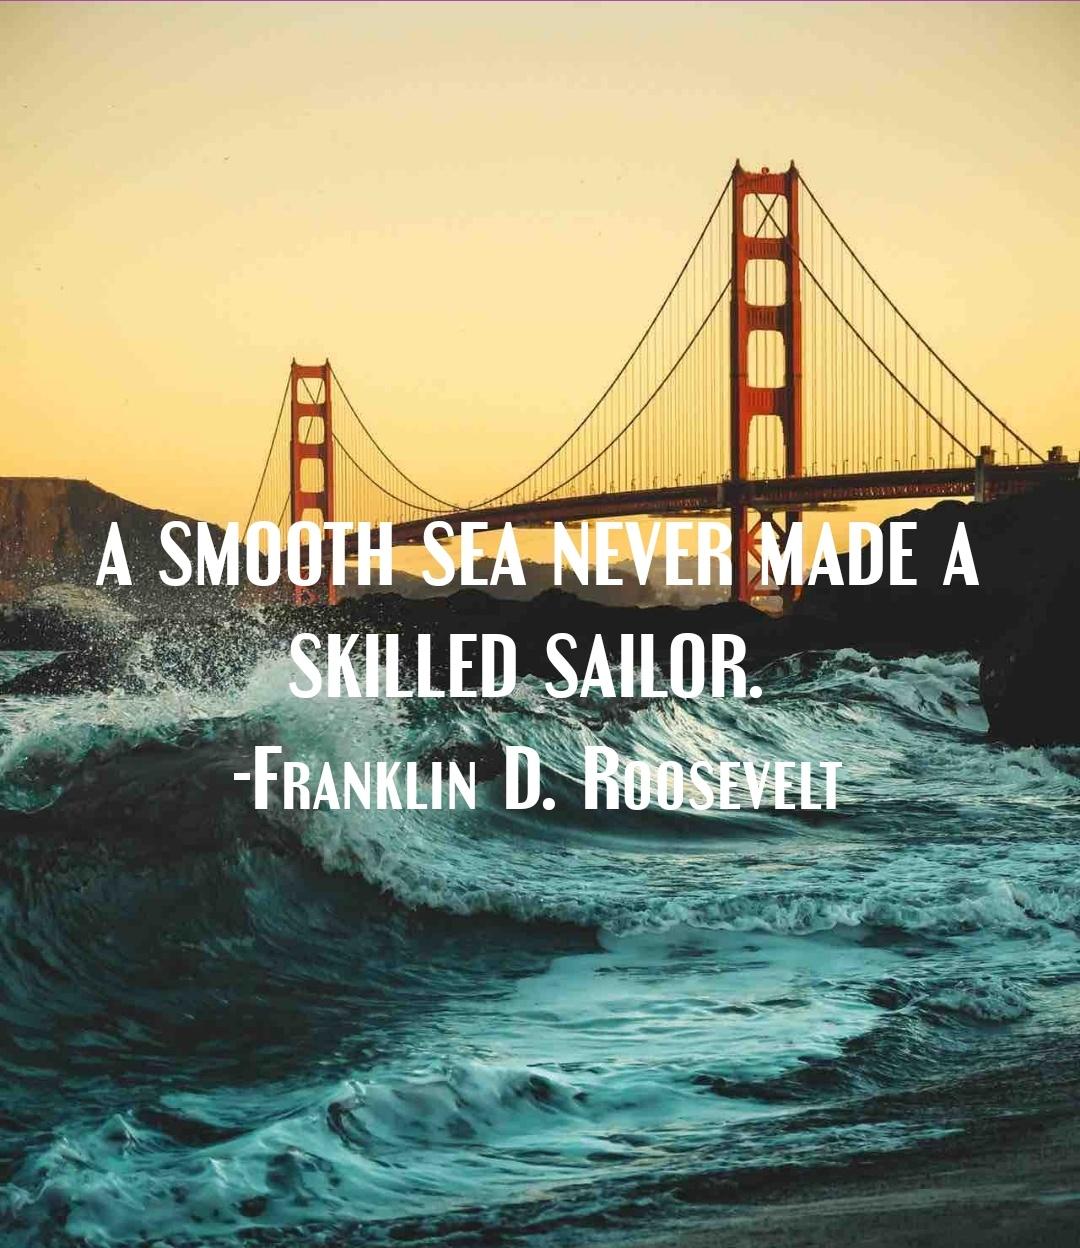 A Smooth Sea Never Made A Skilled Sailor ~ Franklin D. Roosevelt [1080 × 1248]